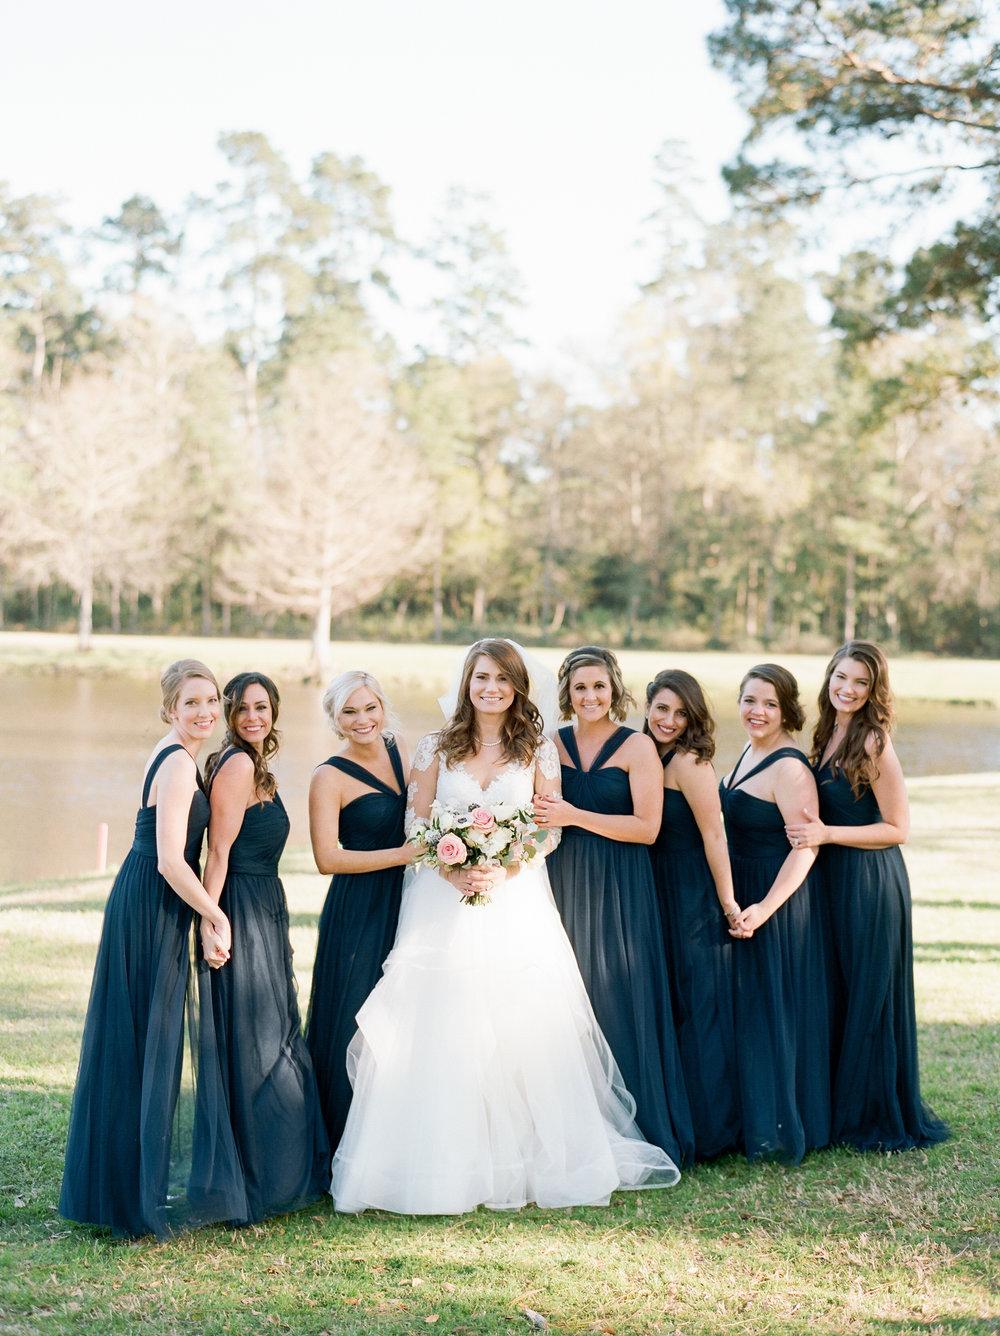 Houston-Wedding-Photographer-Style-Me-Pretty-St-Anne-Catholic-Church-Wedding-The-Woodlands-Country-Club-Palmer-Course-Austin-Wedding-photographer-fine-art-film-19.jpg